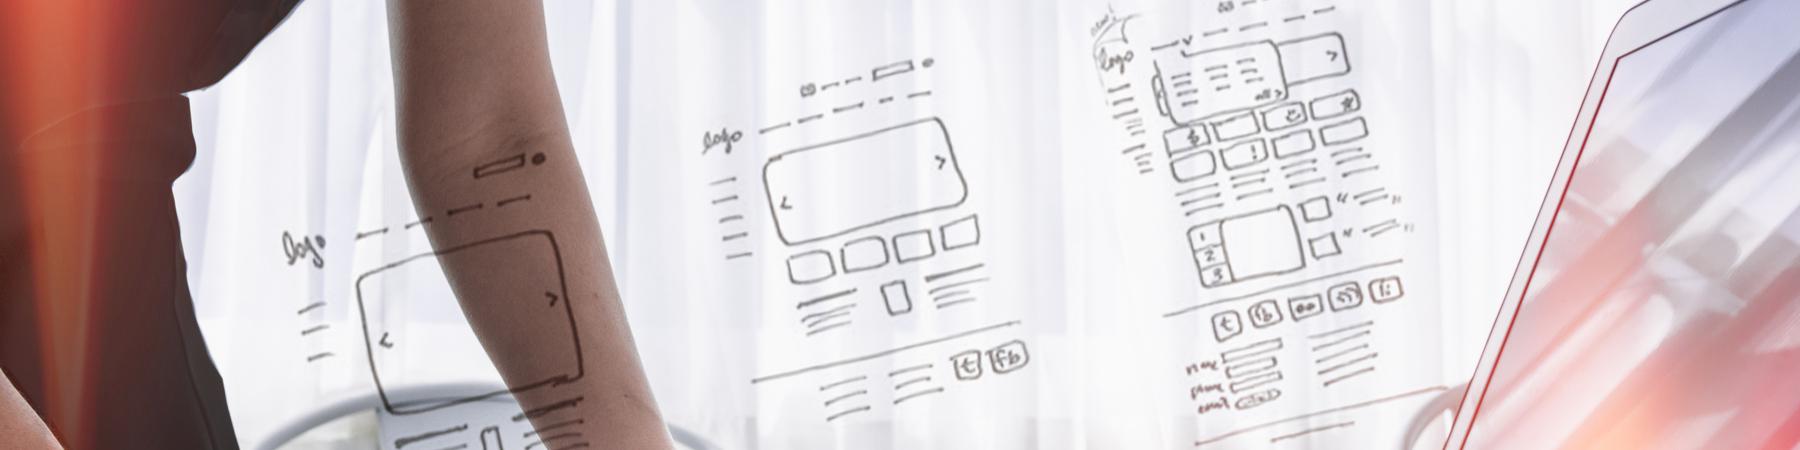 web design wireframes